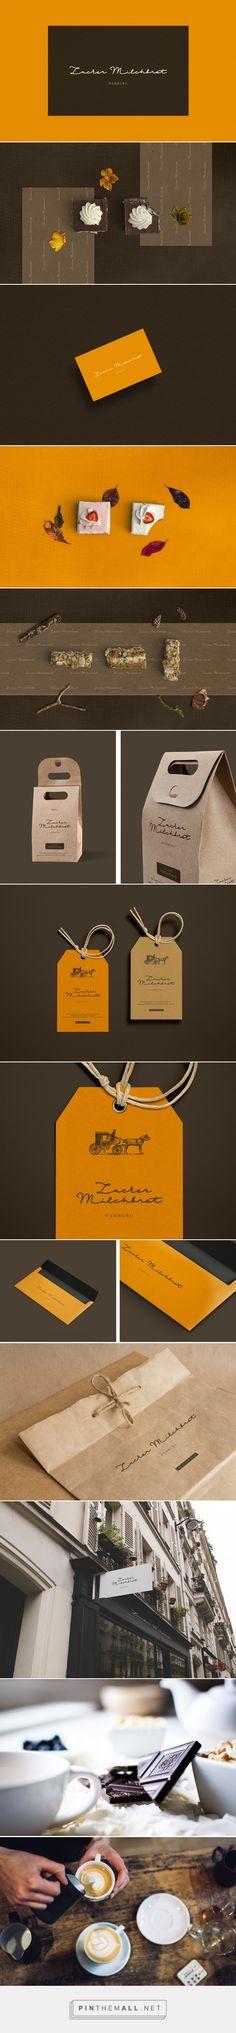 Zucker Milchbrot Bakery Branding by Choi Hwanie | Fivestar Branding Agency – Design and Branding Agency & Curated Inspiration Gallery